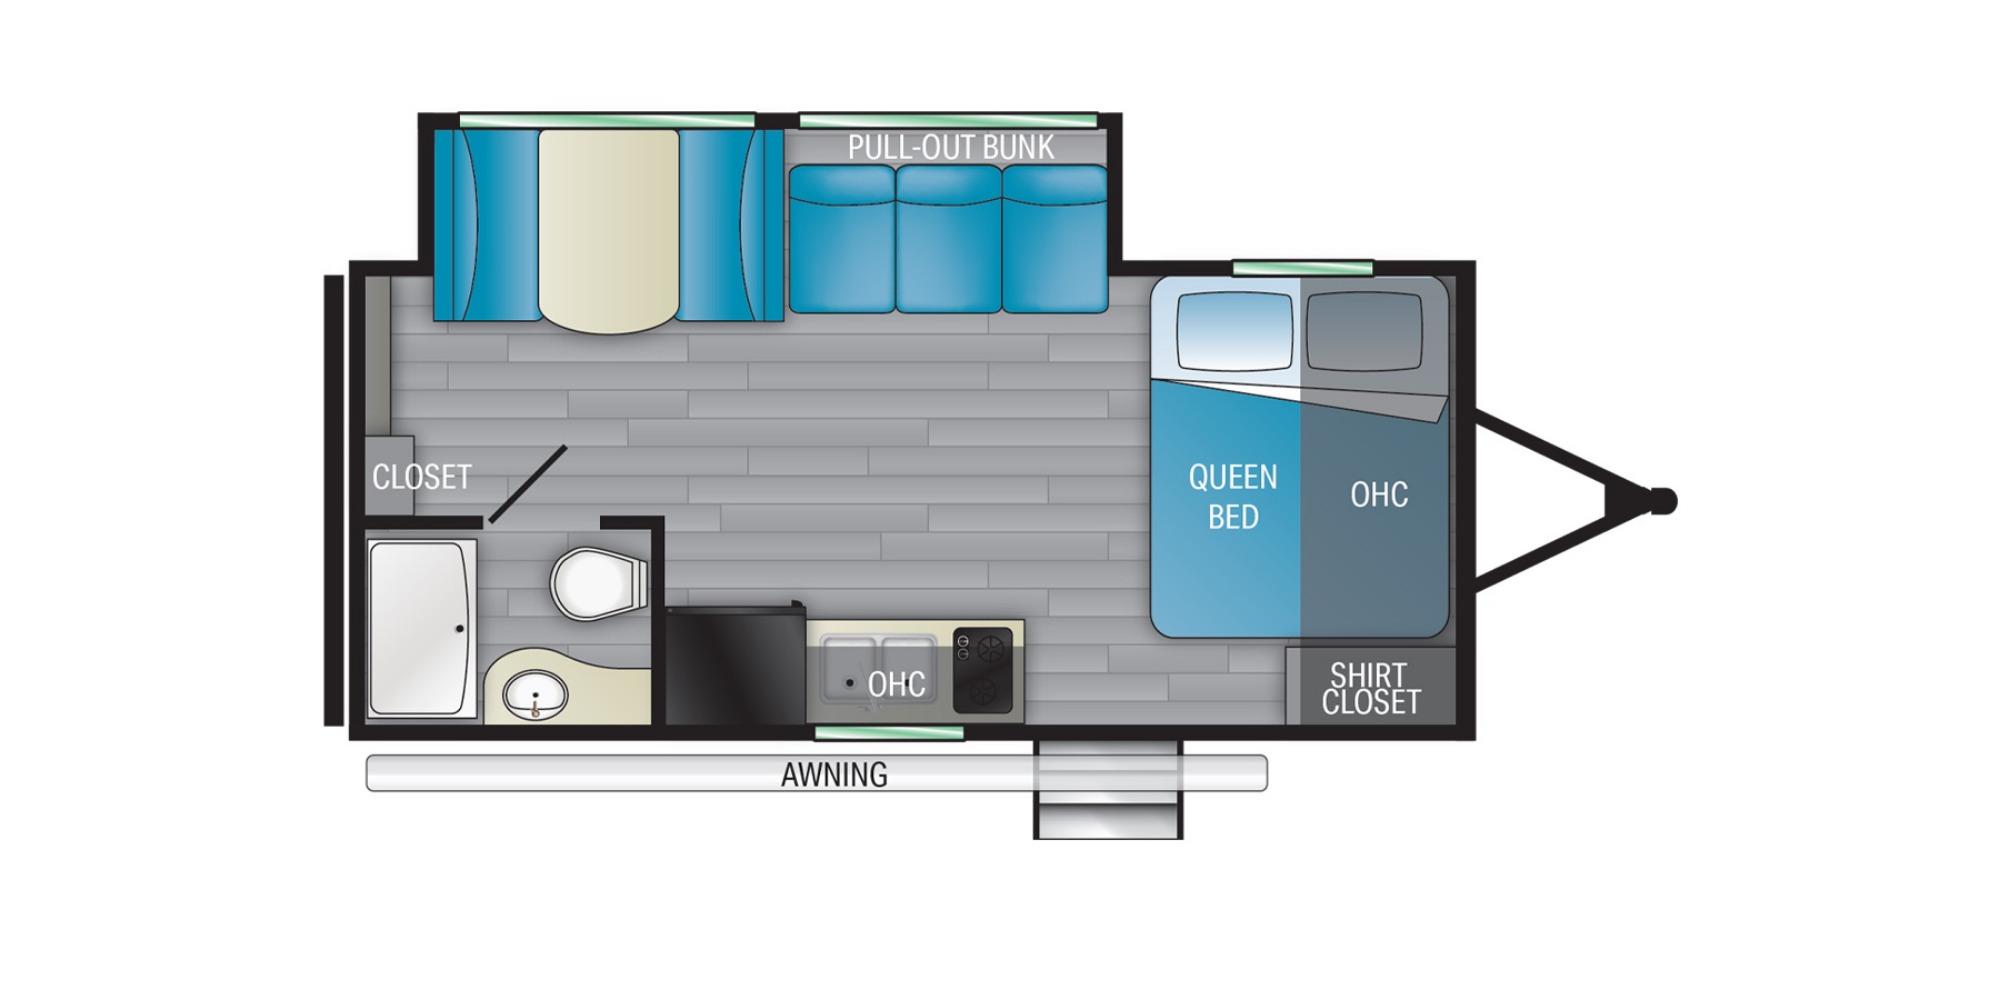 View Floor Plan for 2022 HEARTLAND PIONEER SS171